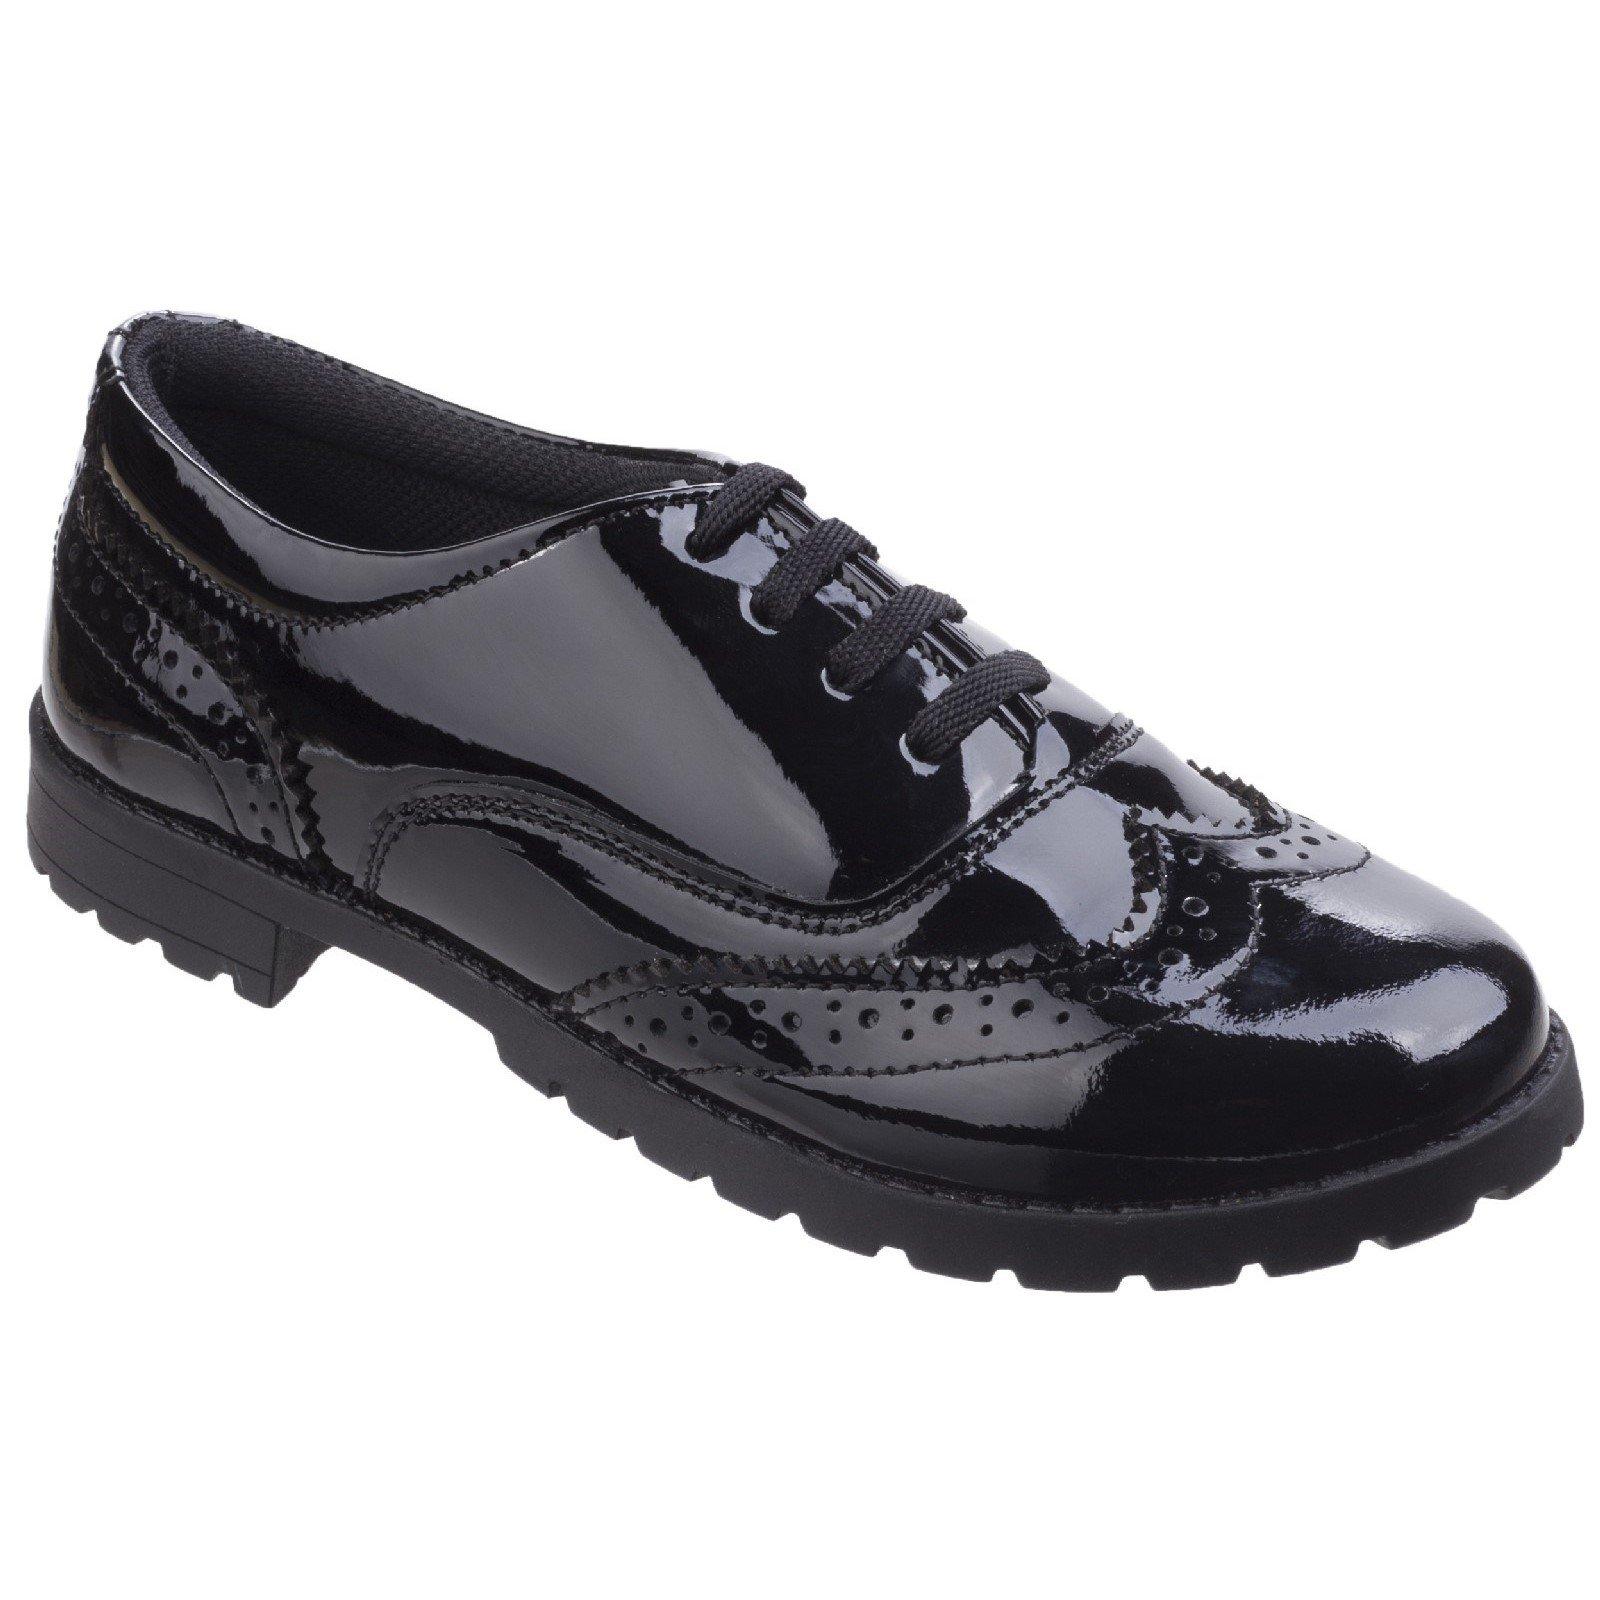 Hush Puppies Kid's Eadie Senior Patent School Shoe Black 32735 - Patent Black 6